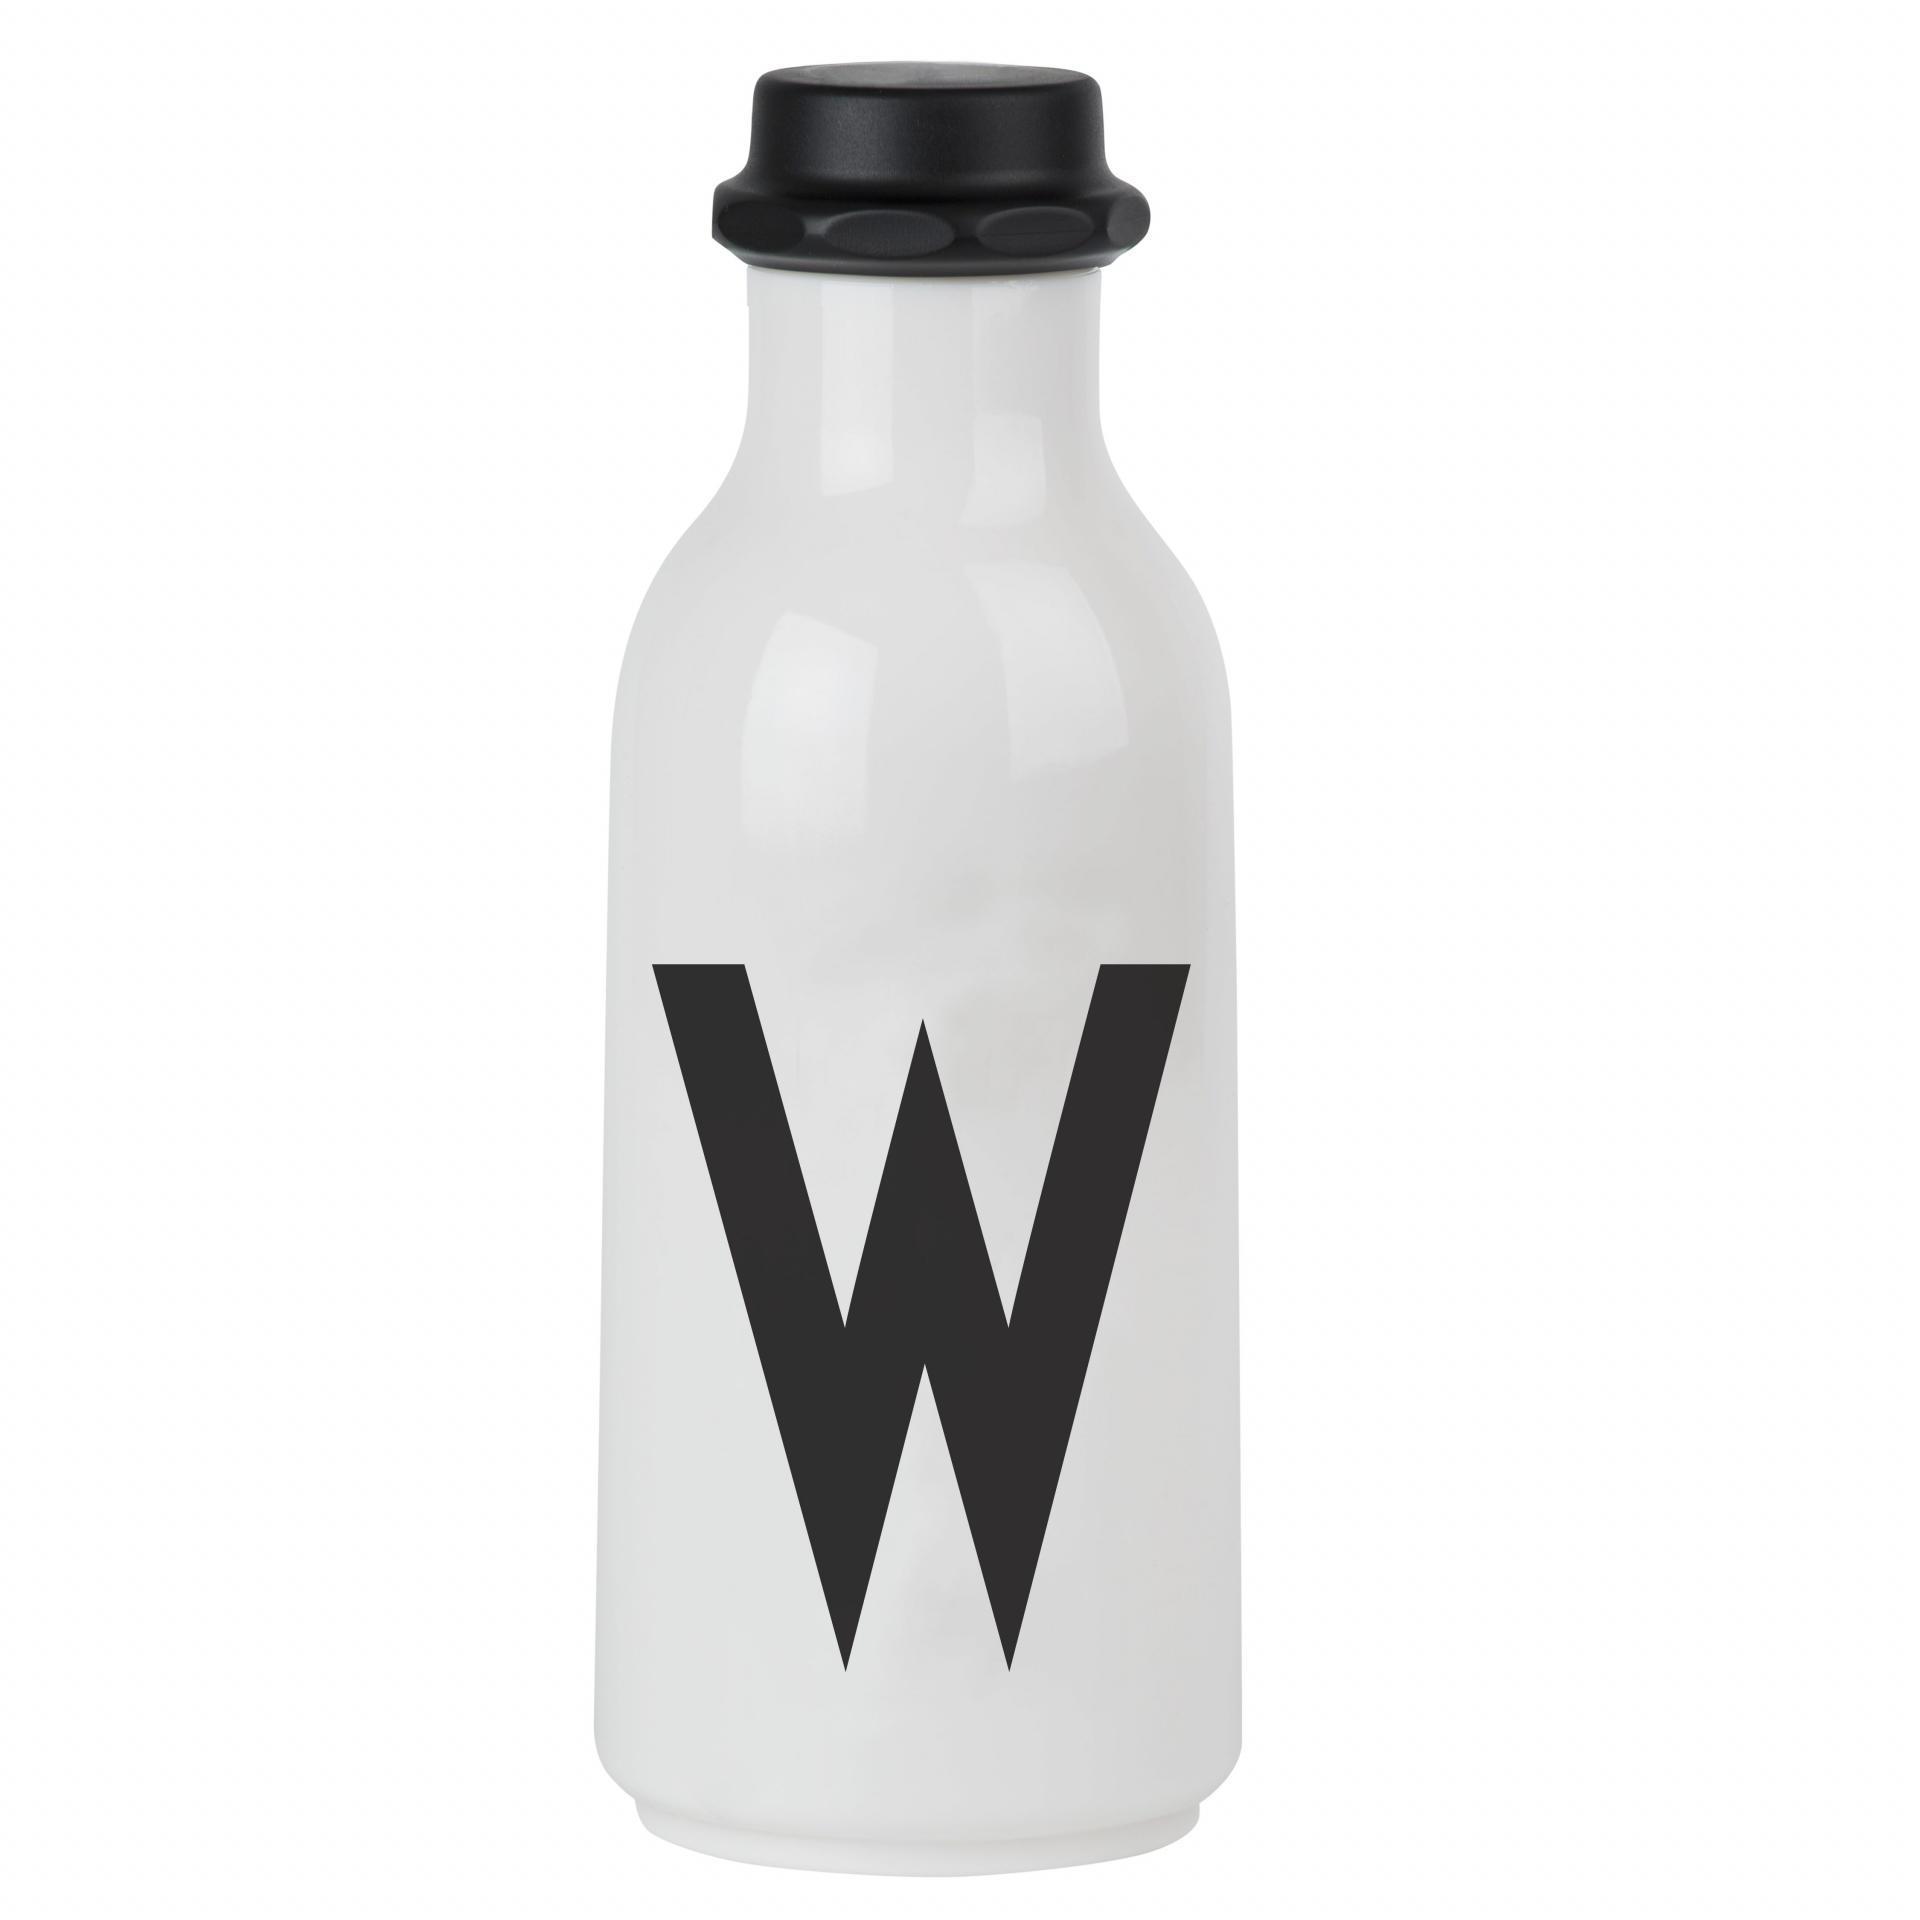 DESIGN LETTERS Lahev na vodu Letters B, černá barva, bílá barva, plast